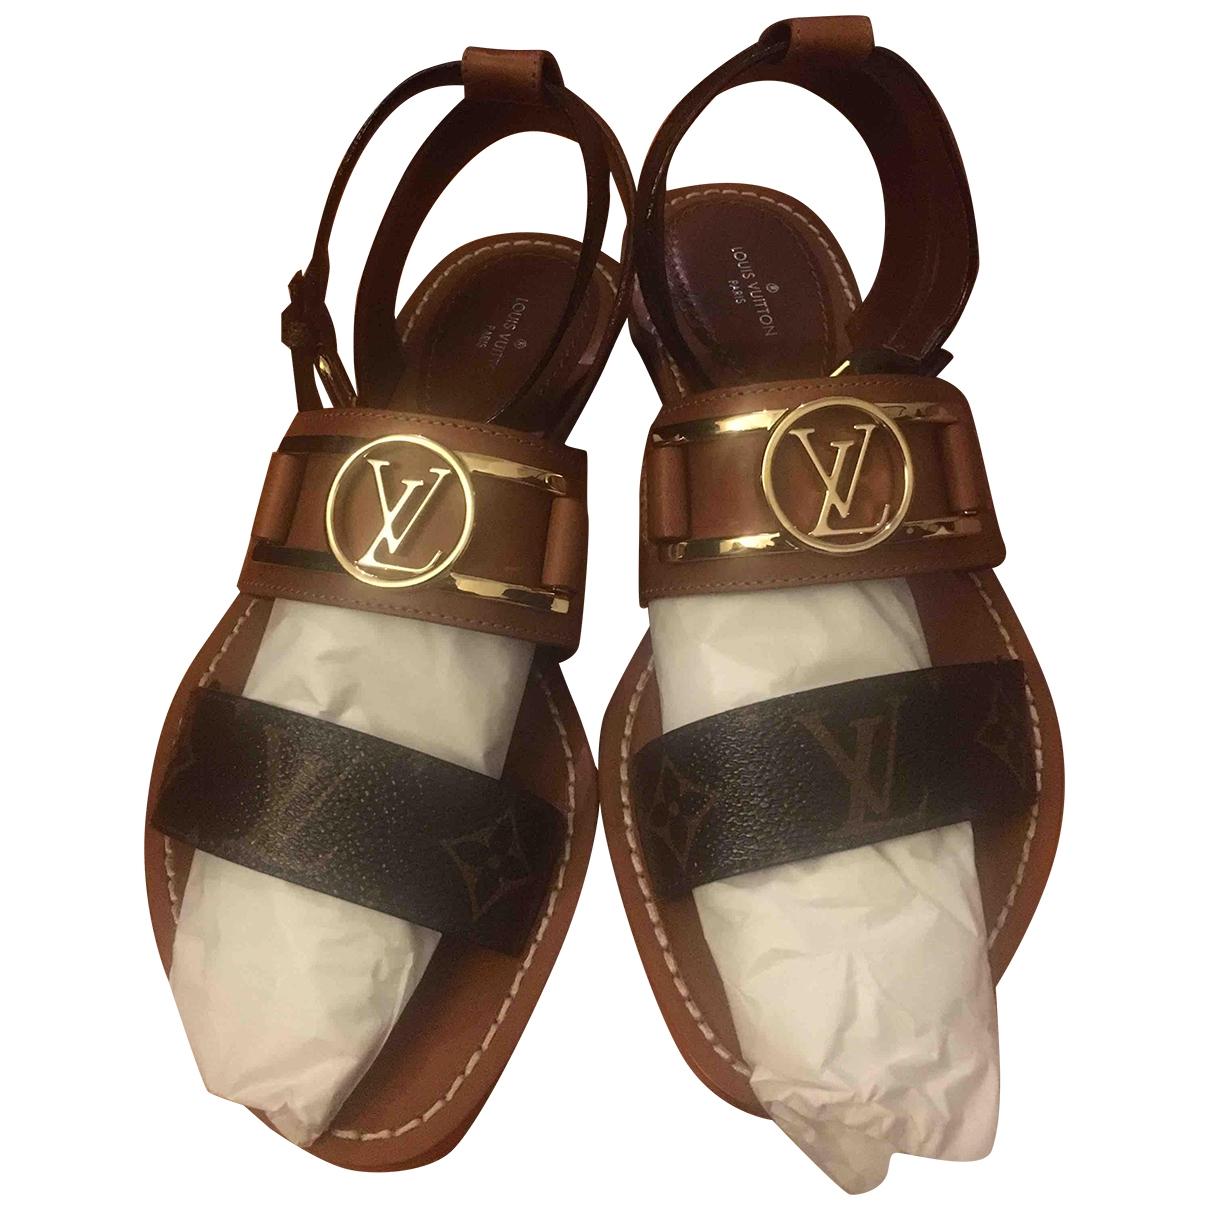 Louis Vuitton \N Brown Leather Sandals for Women 37 EU